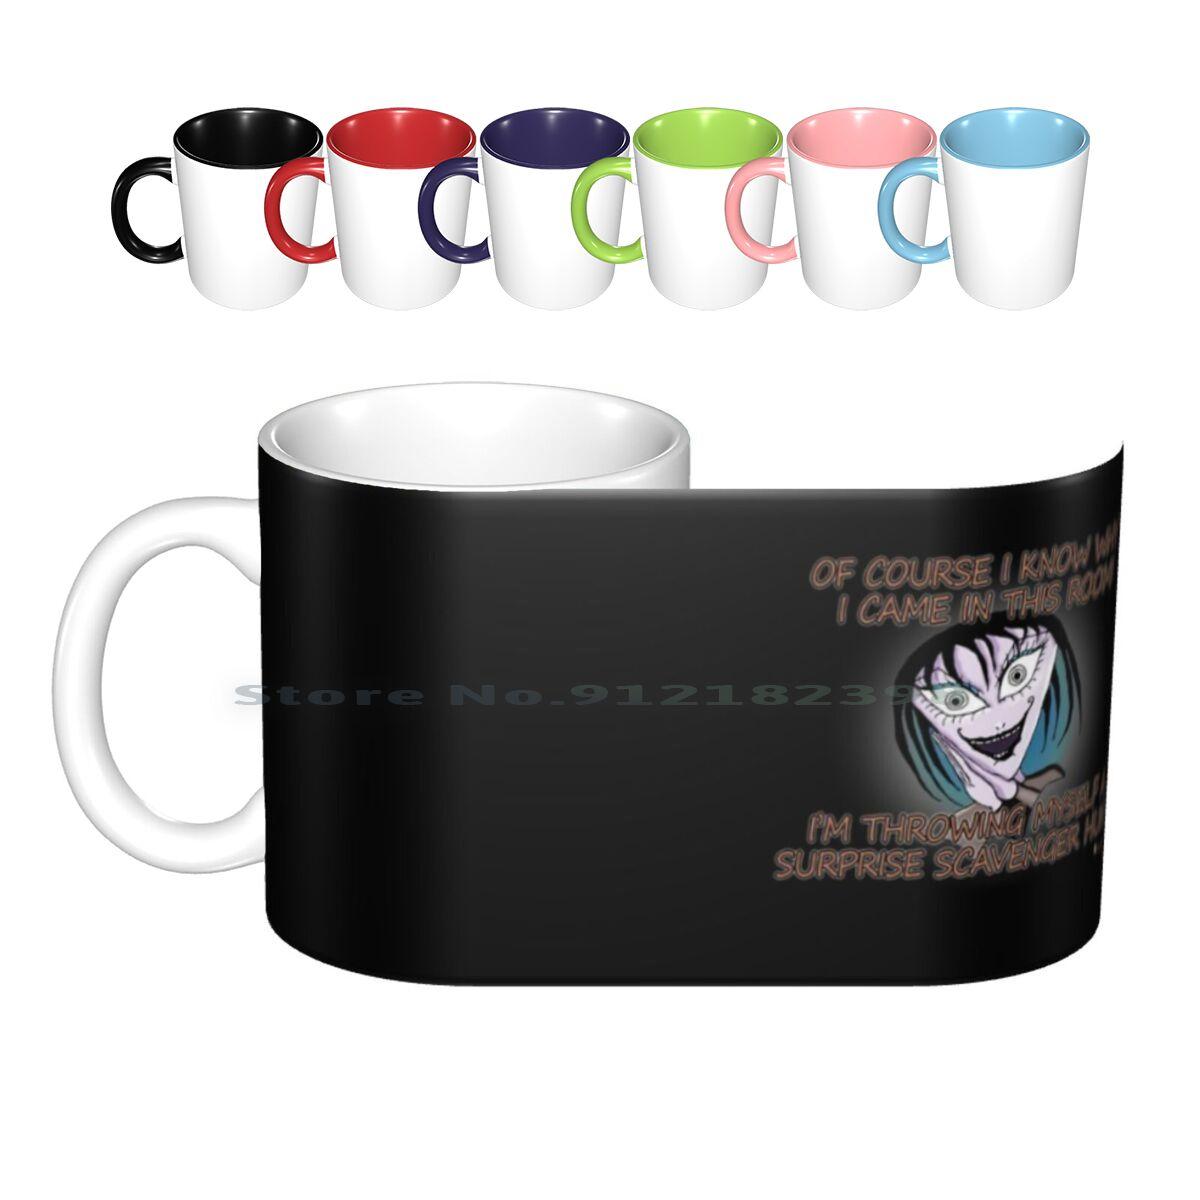 Menopause Symptoms Humor-Brain Fog | Destress Midlife Birthday Middle Age Dark Humor Idea Ceramic Mugs Coffee Cups Milk Tea Mug